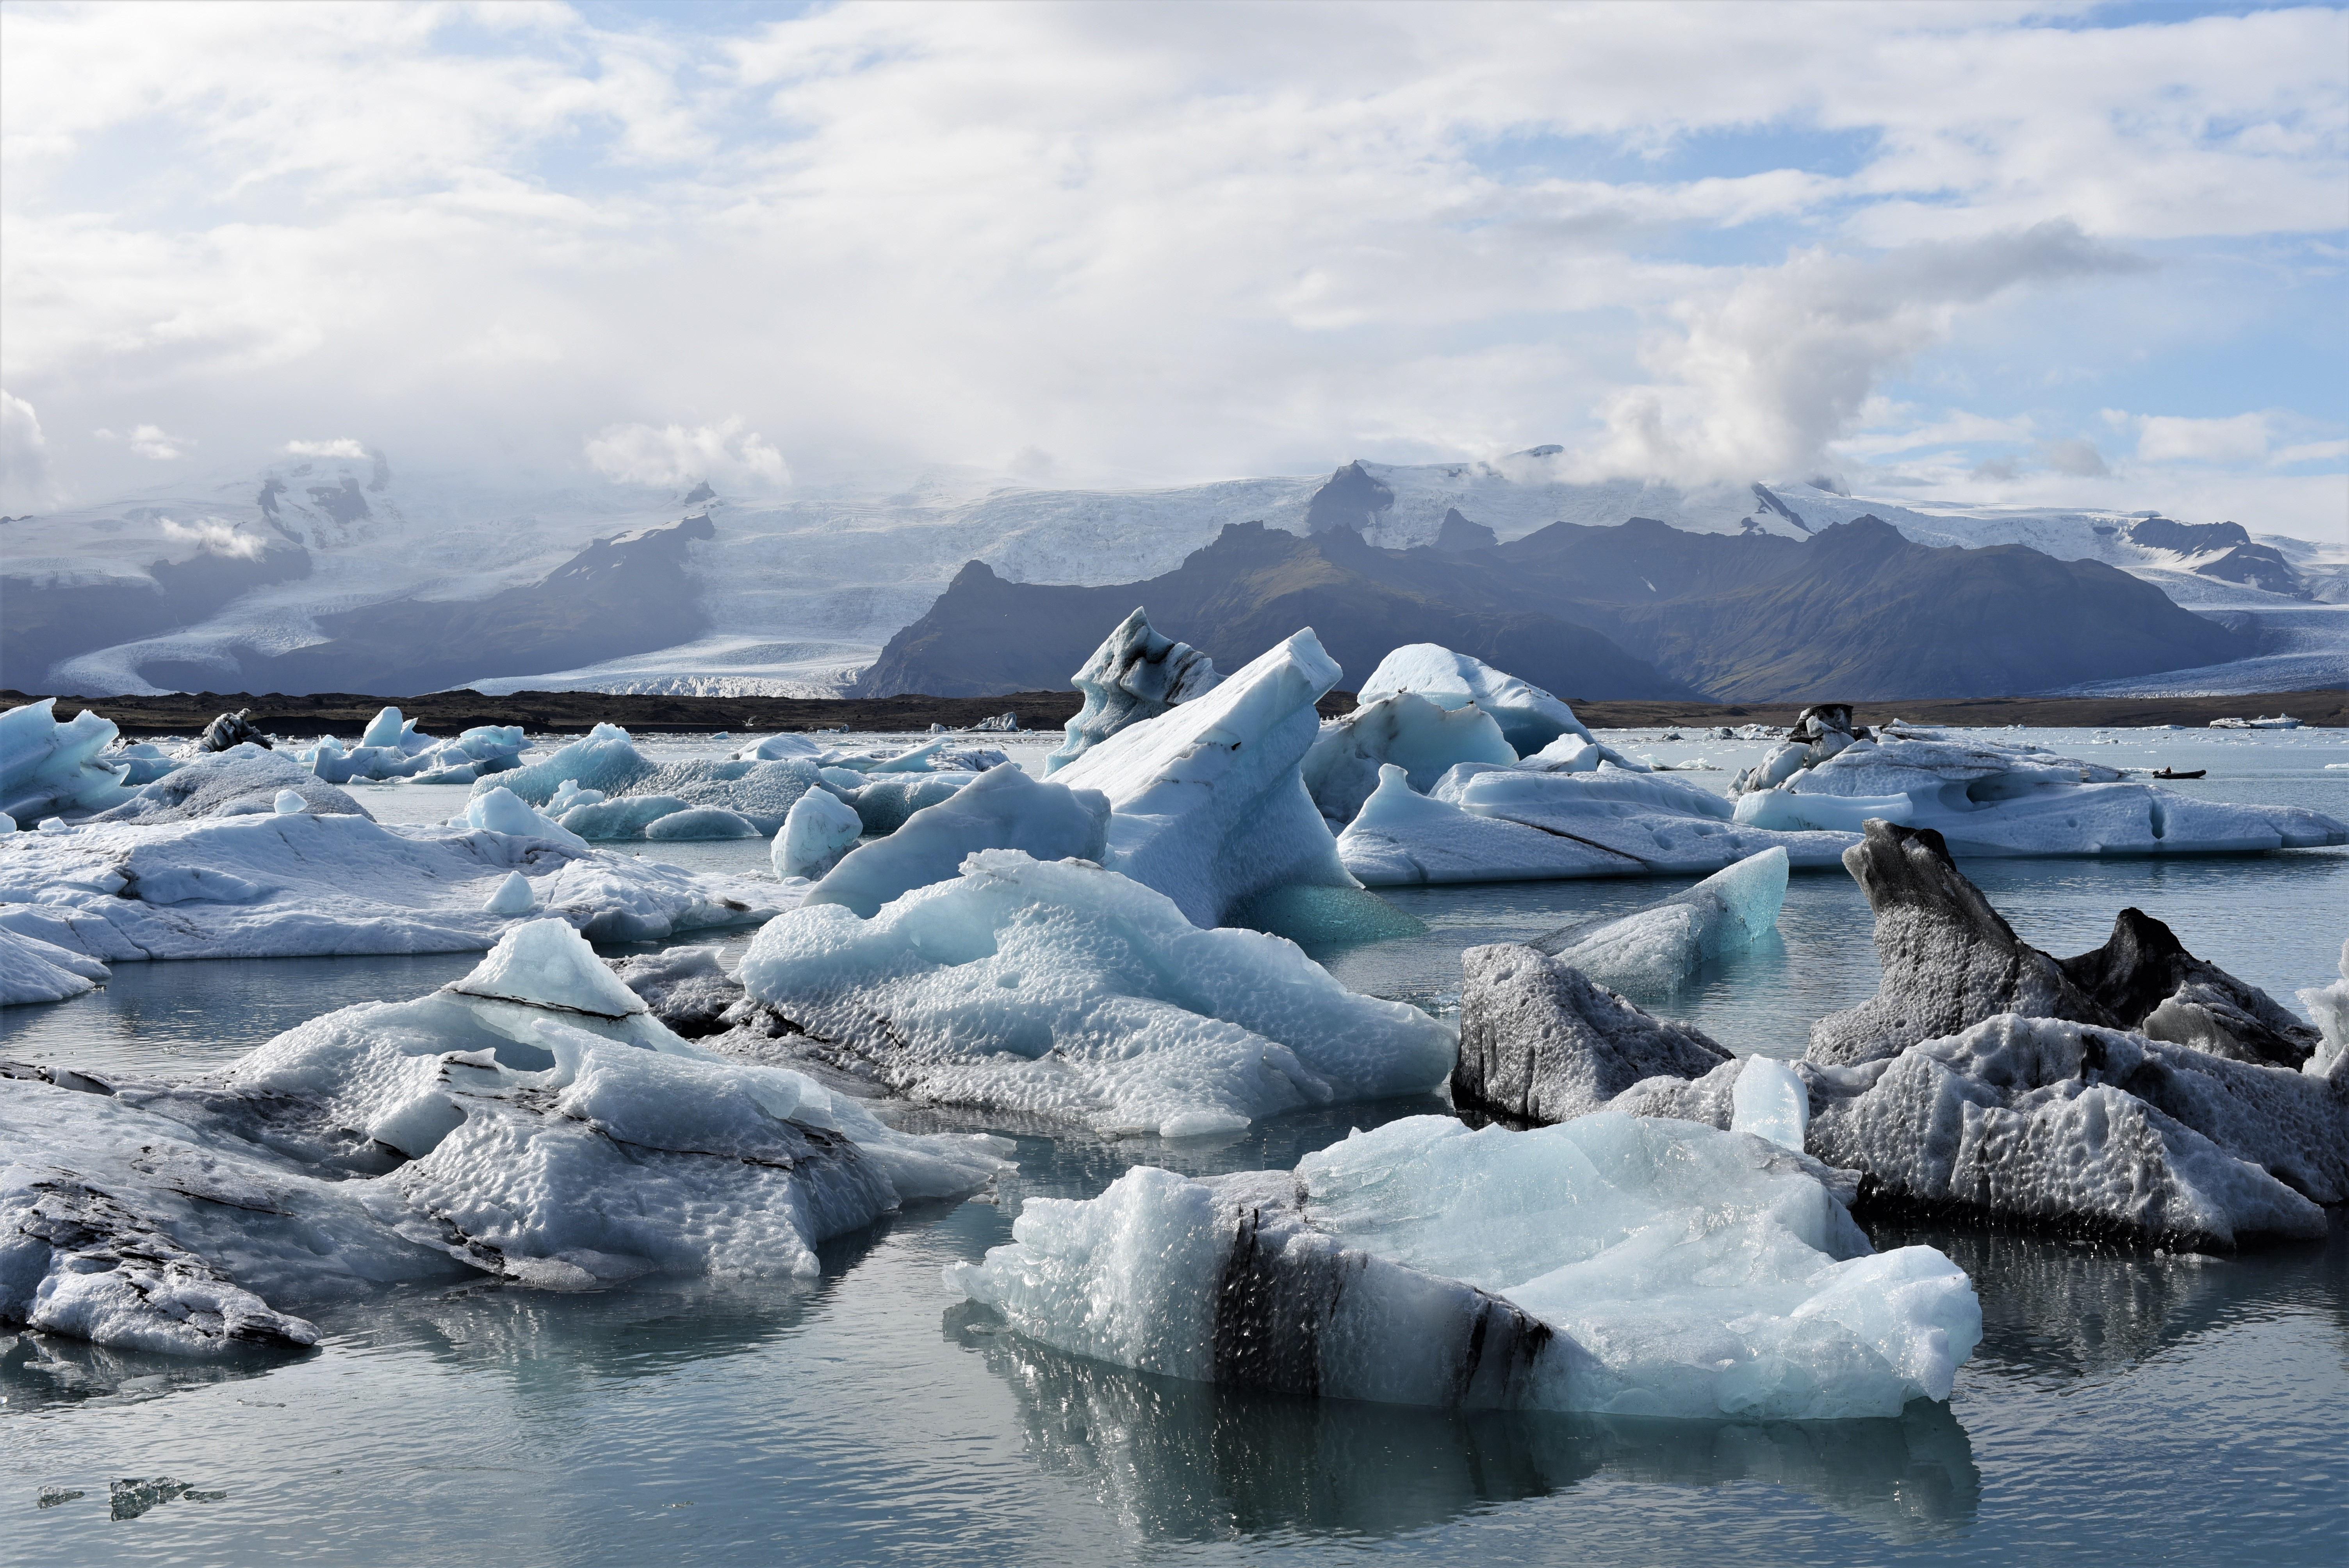 81923 Заставки и Обои Лед на телефон. Скачать Лед, Зима, Природа, Вода, Арктика картинки бесплатно